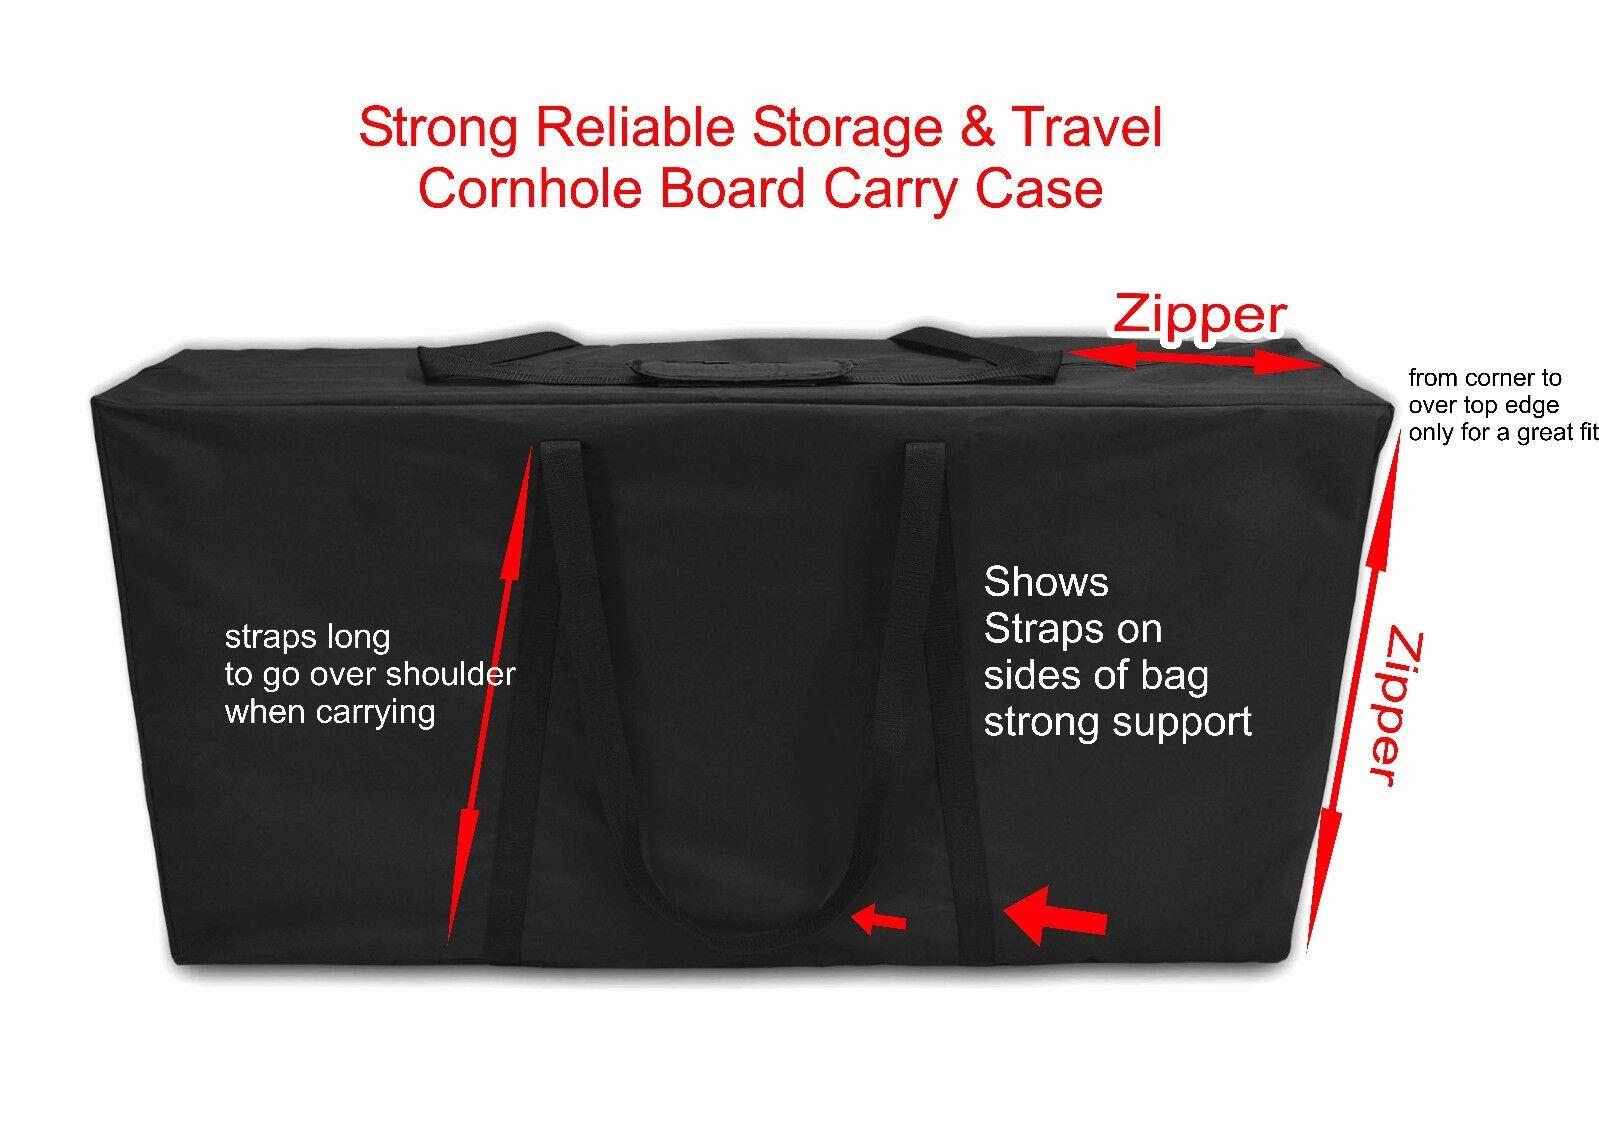 NEW Heavy Canvas Closed Zipper CORNHOLE Corn Toss Board CARRY CASE Fit 2 Boards